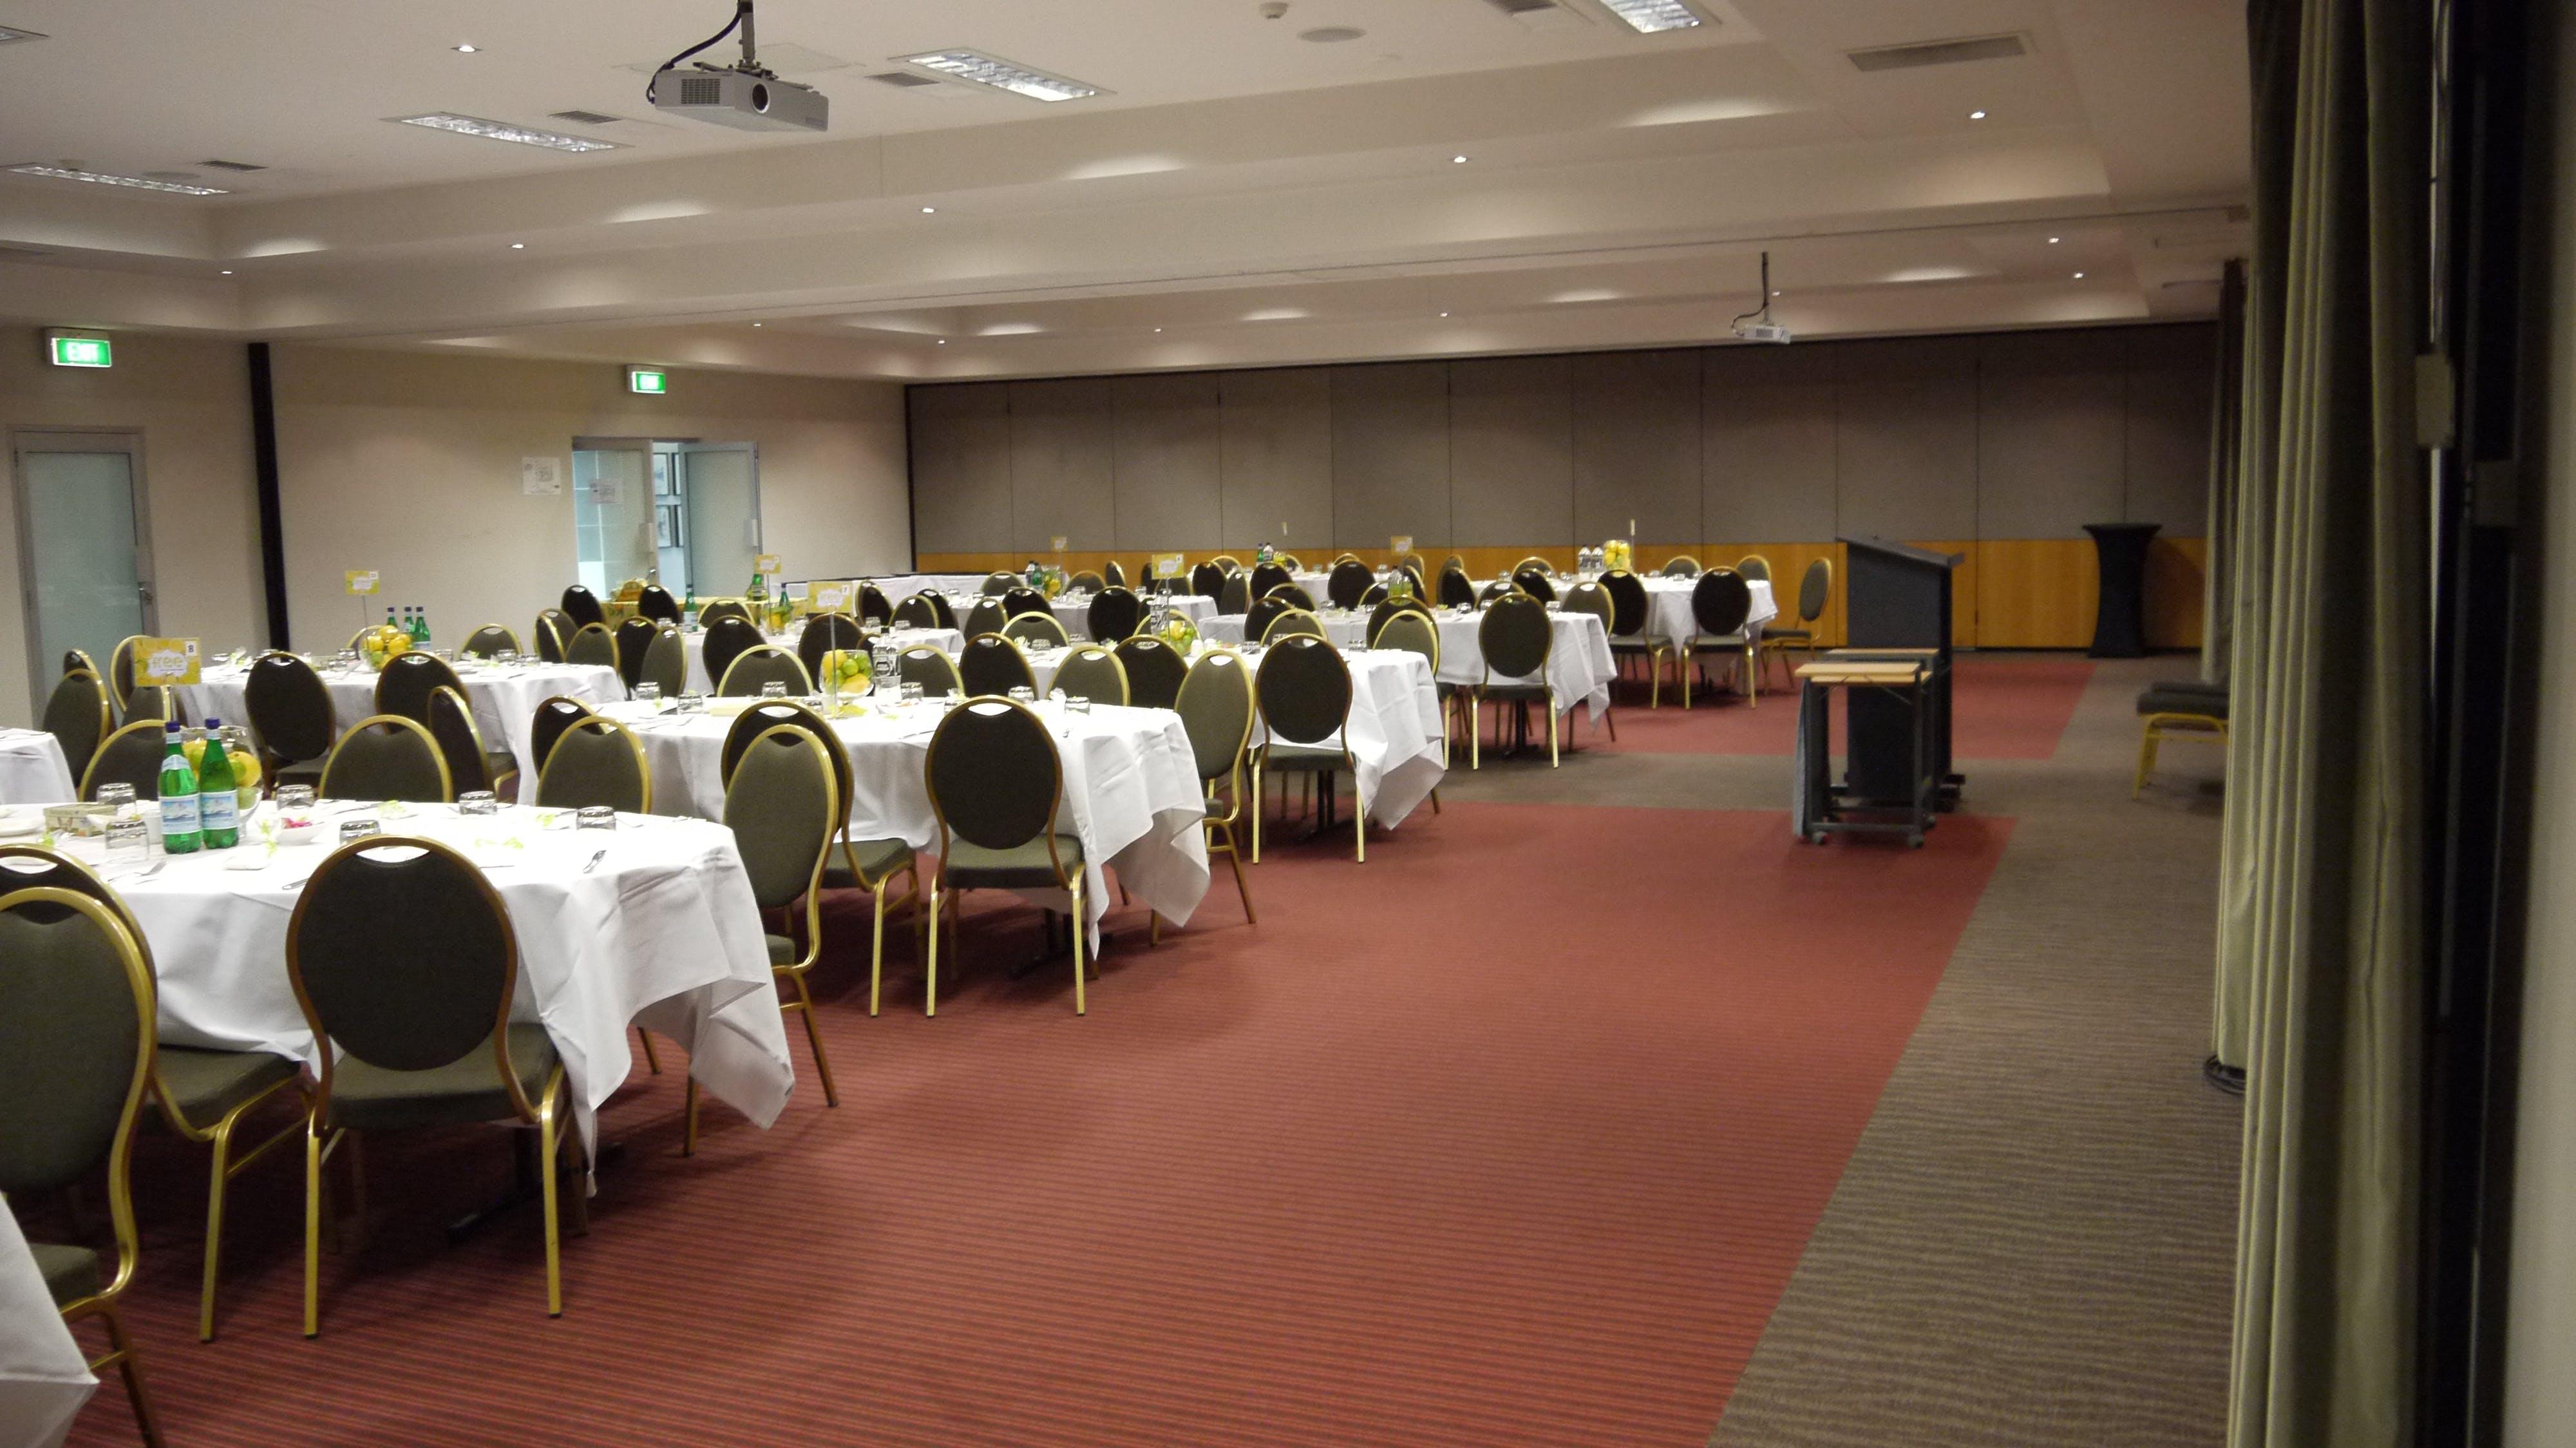 Booval Room, meeting room at Metro Hotel Ipswich International, image 1